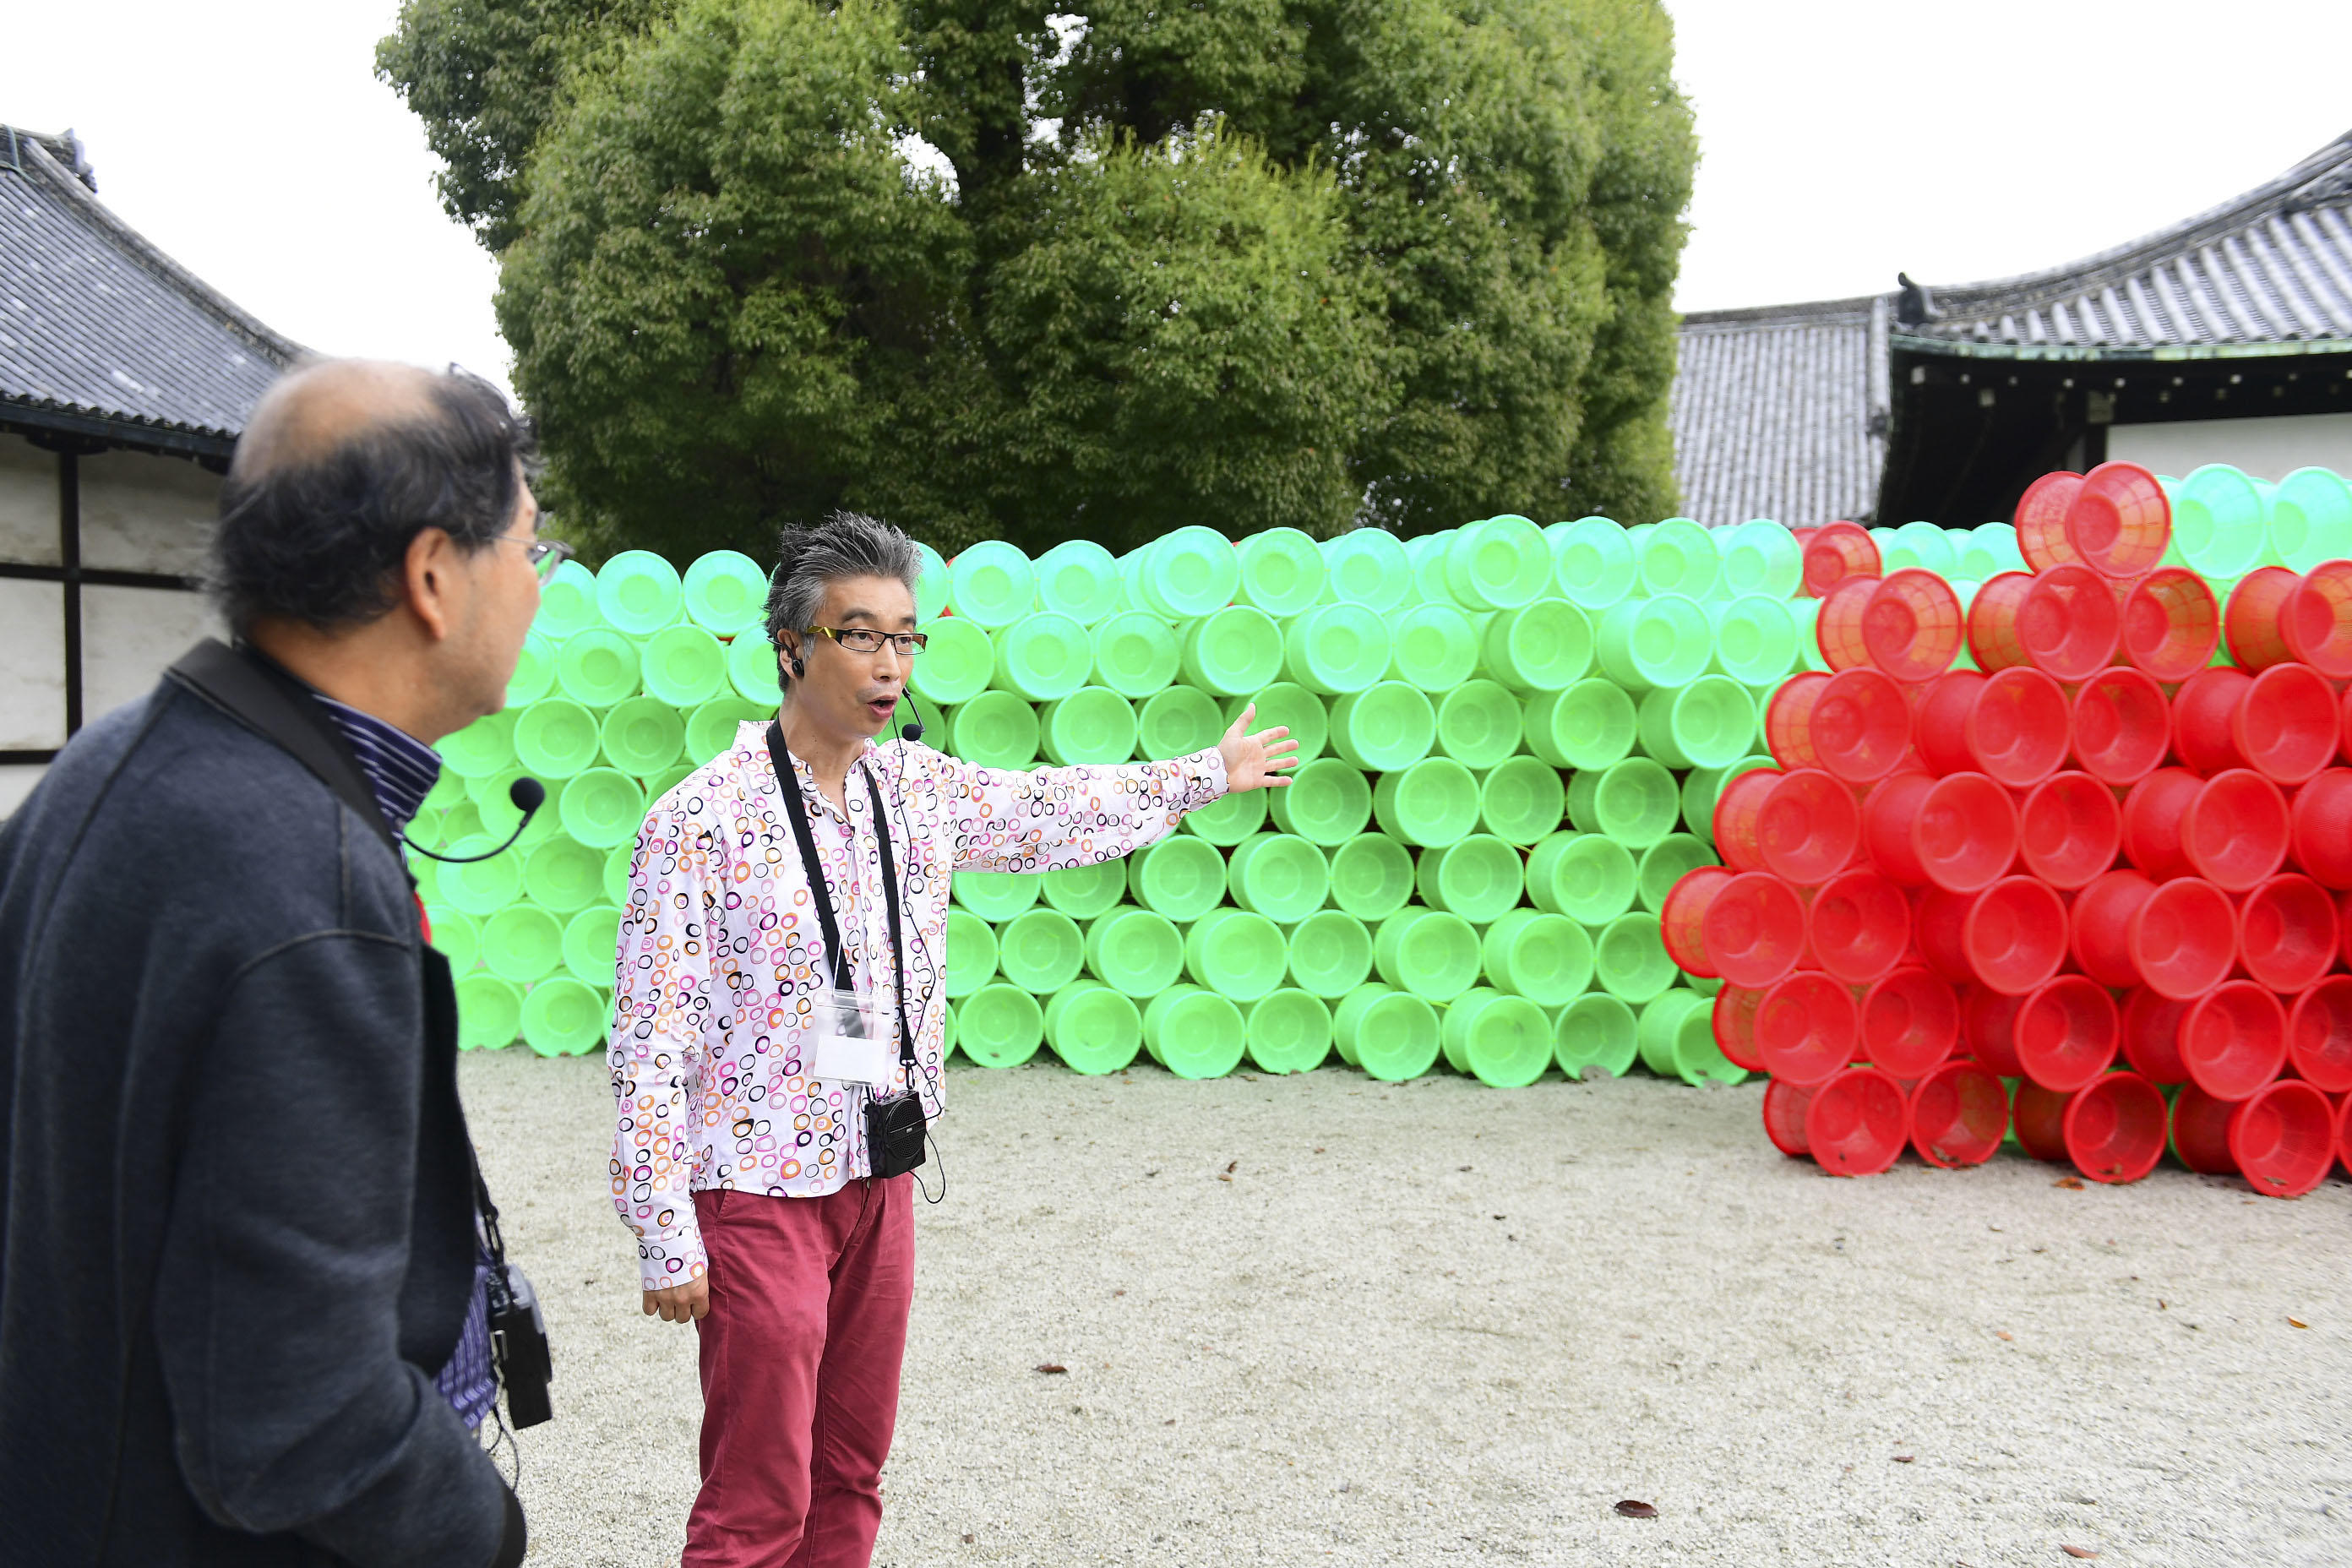 http://news.yoshimoto.co.jp/20171008182239-0a875c79f9b003759a99a5450d4b13c145726342.jpg